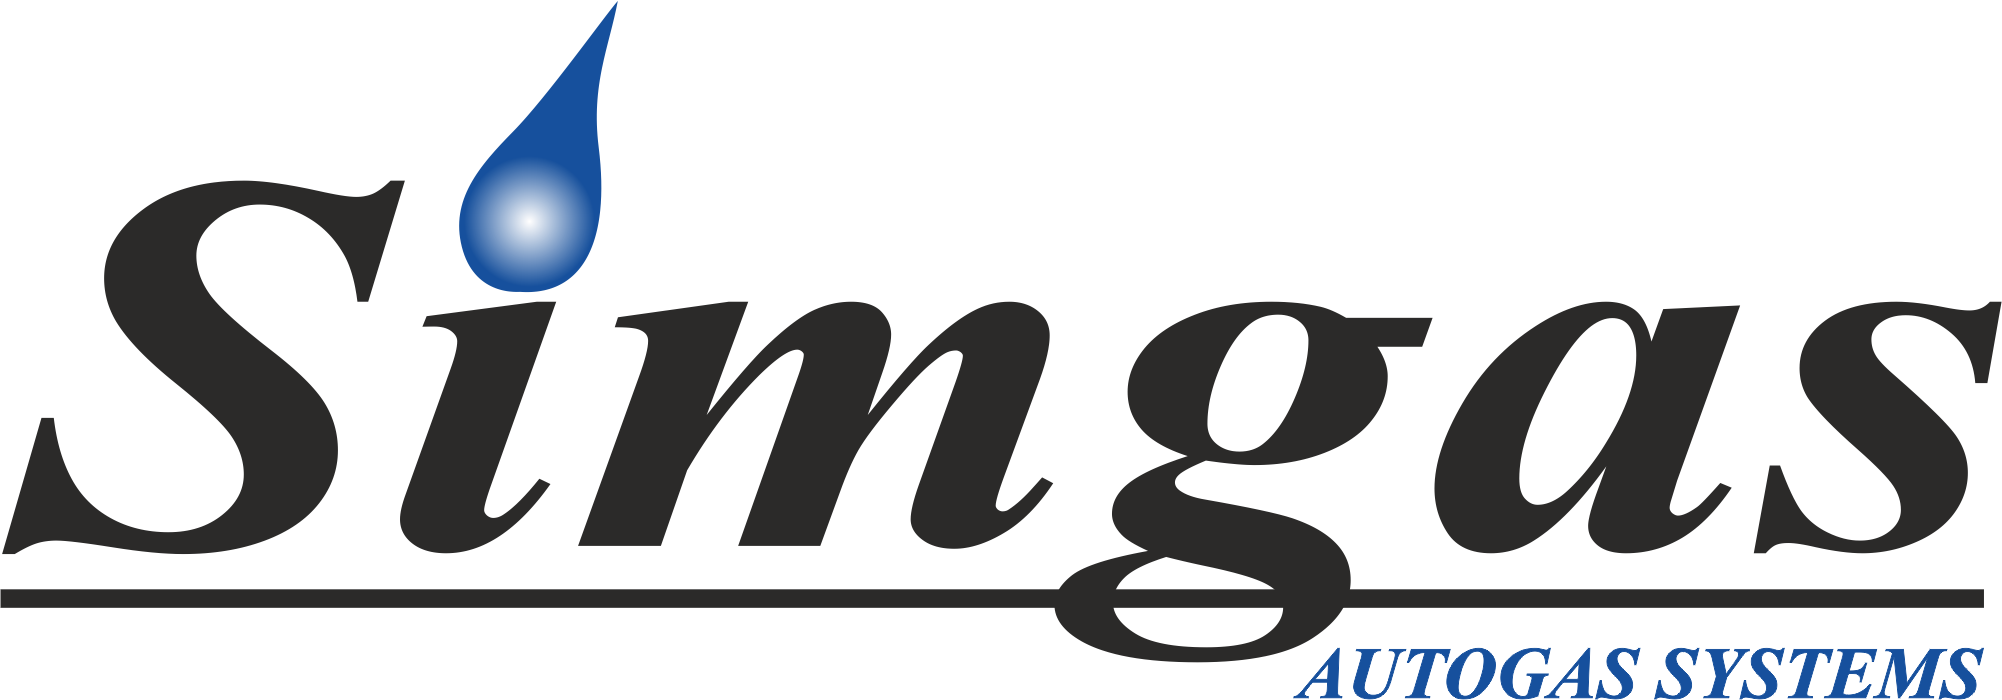 Газов инжекцион, Газов инжекцион Stargas-Simgas